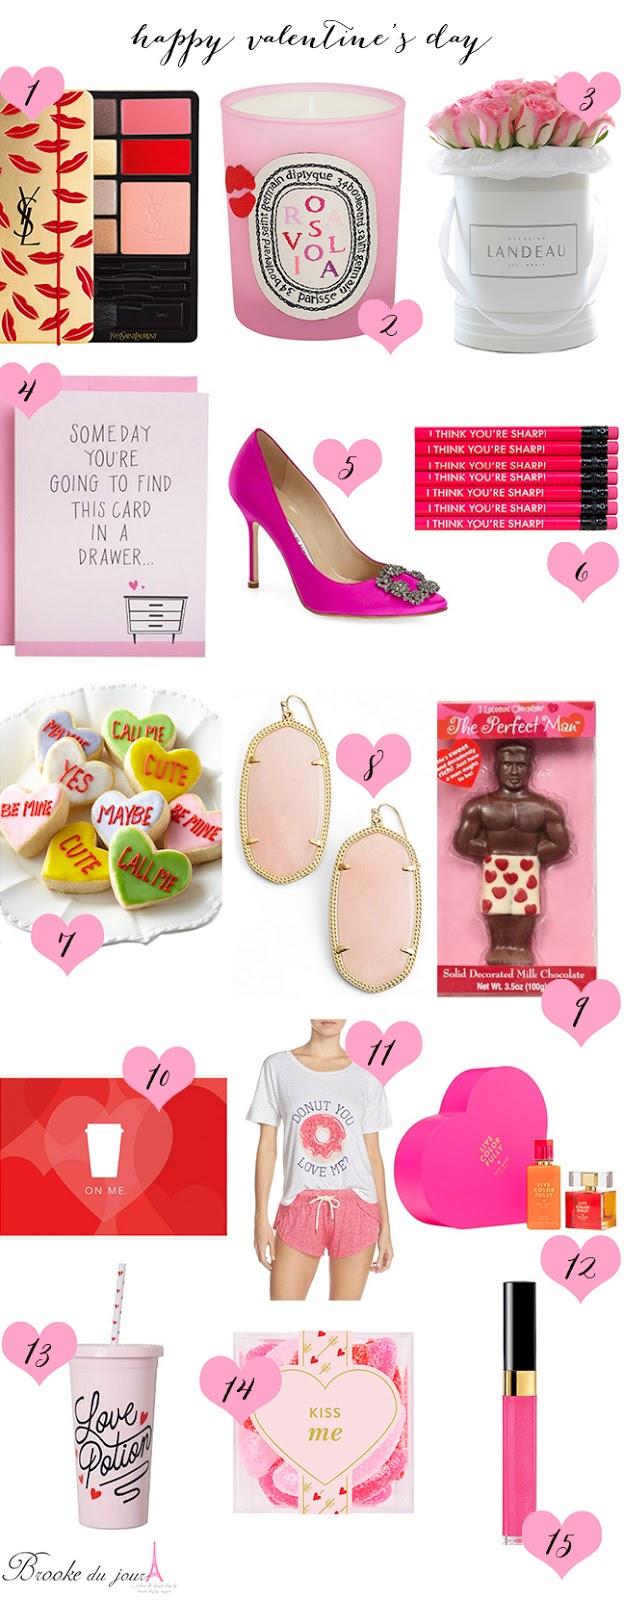 valentines-day-gift-ideas